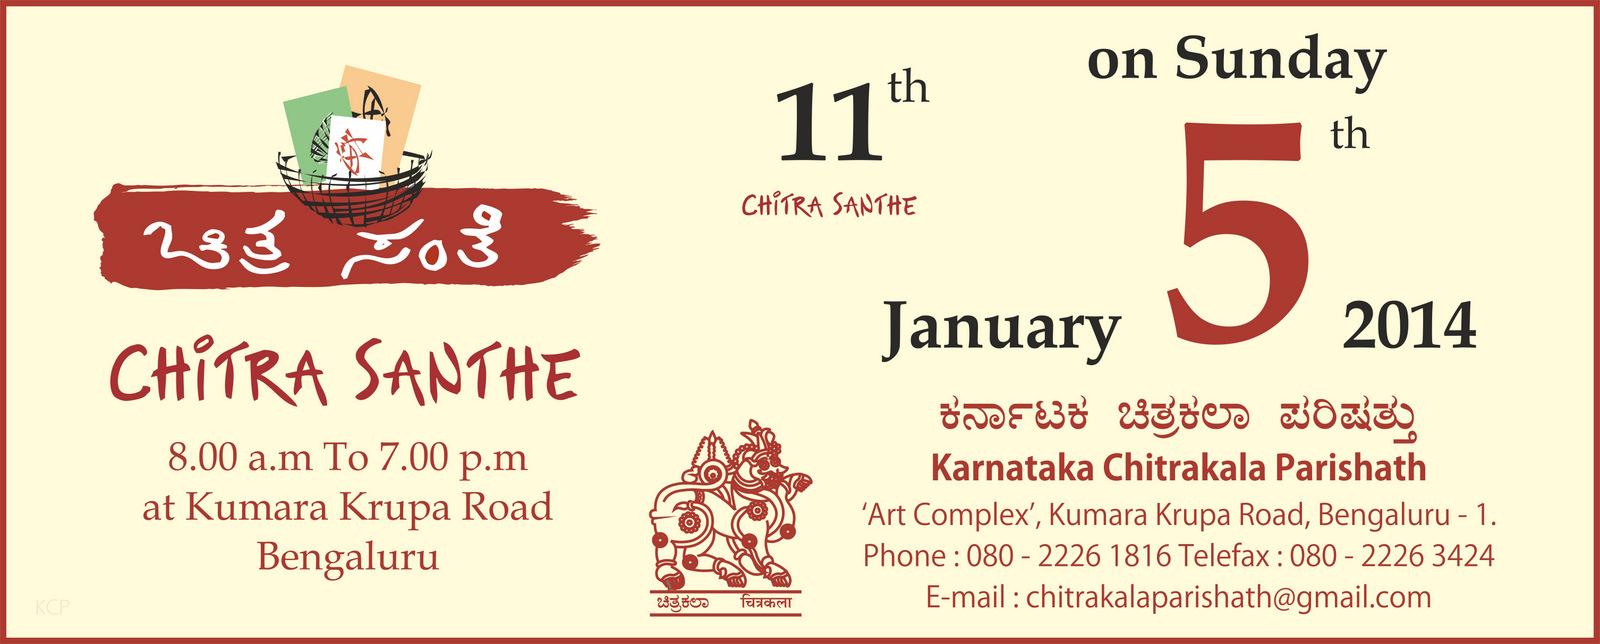 Pencil And Chai At ChitraSanthe Pencil And Chai At ChitraSanthe chitrasanthe 2014